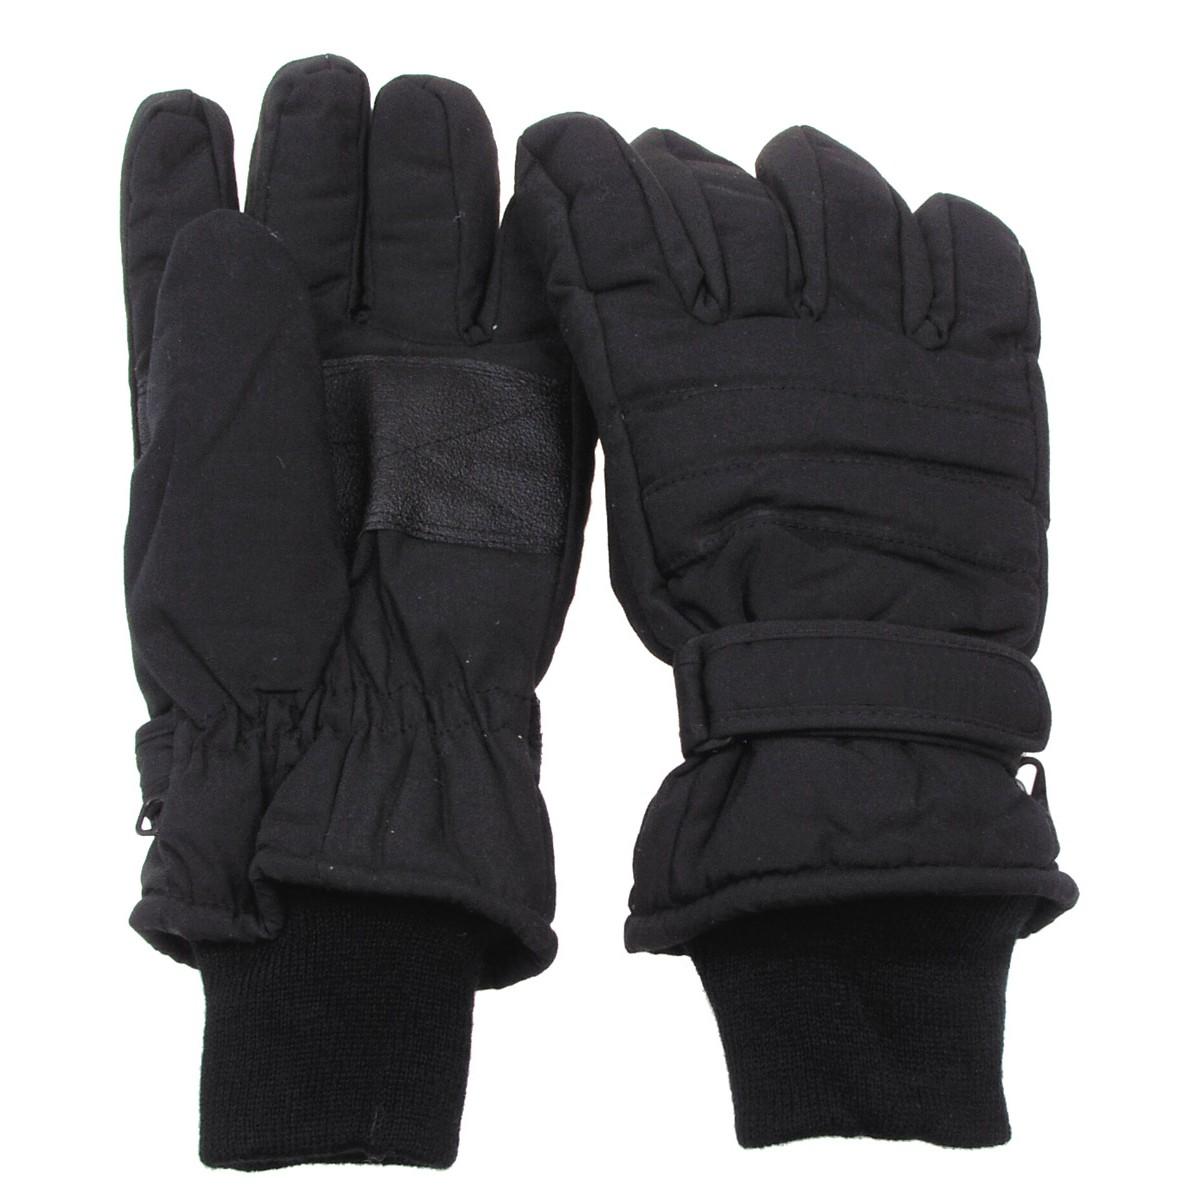 15474A rukavice crne